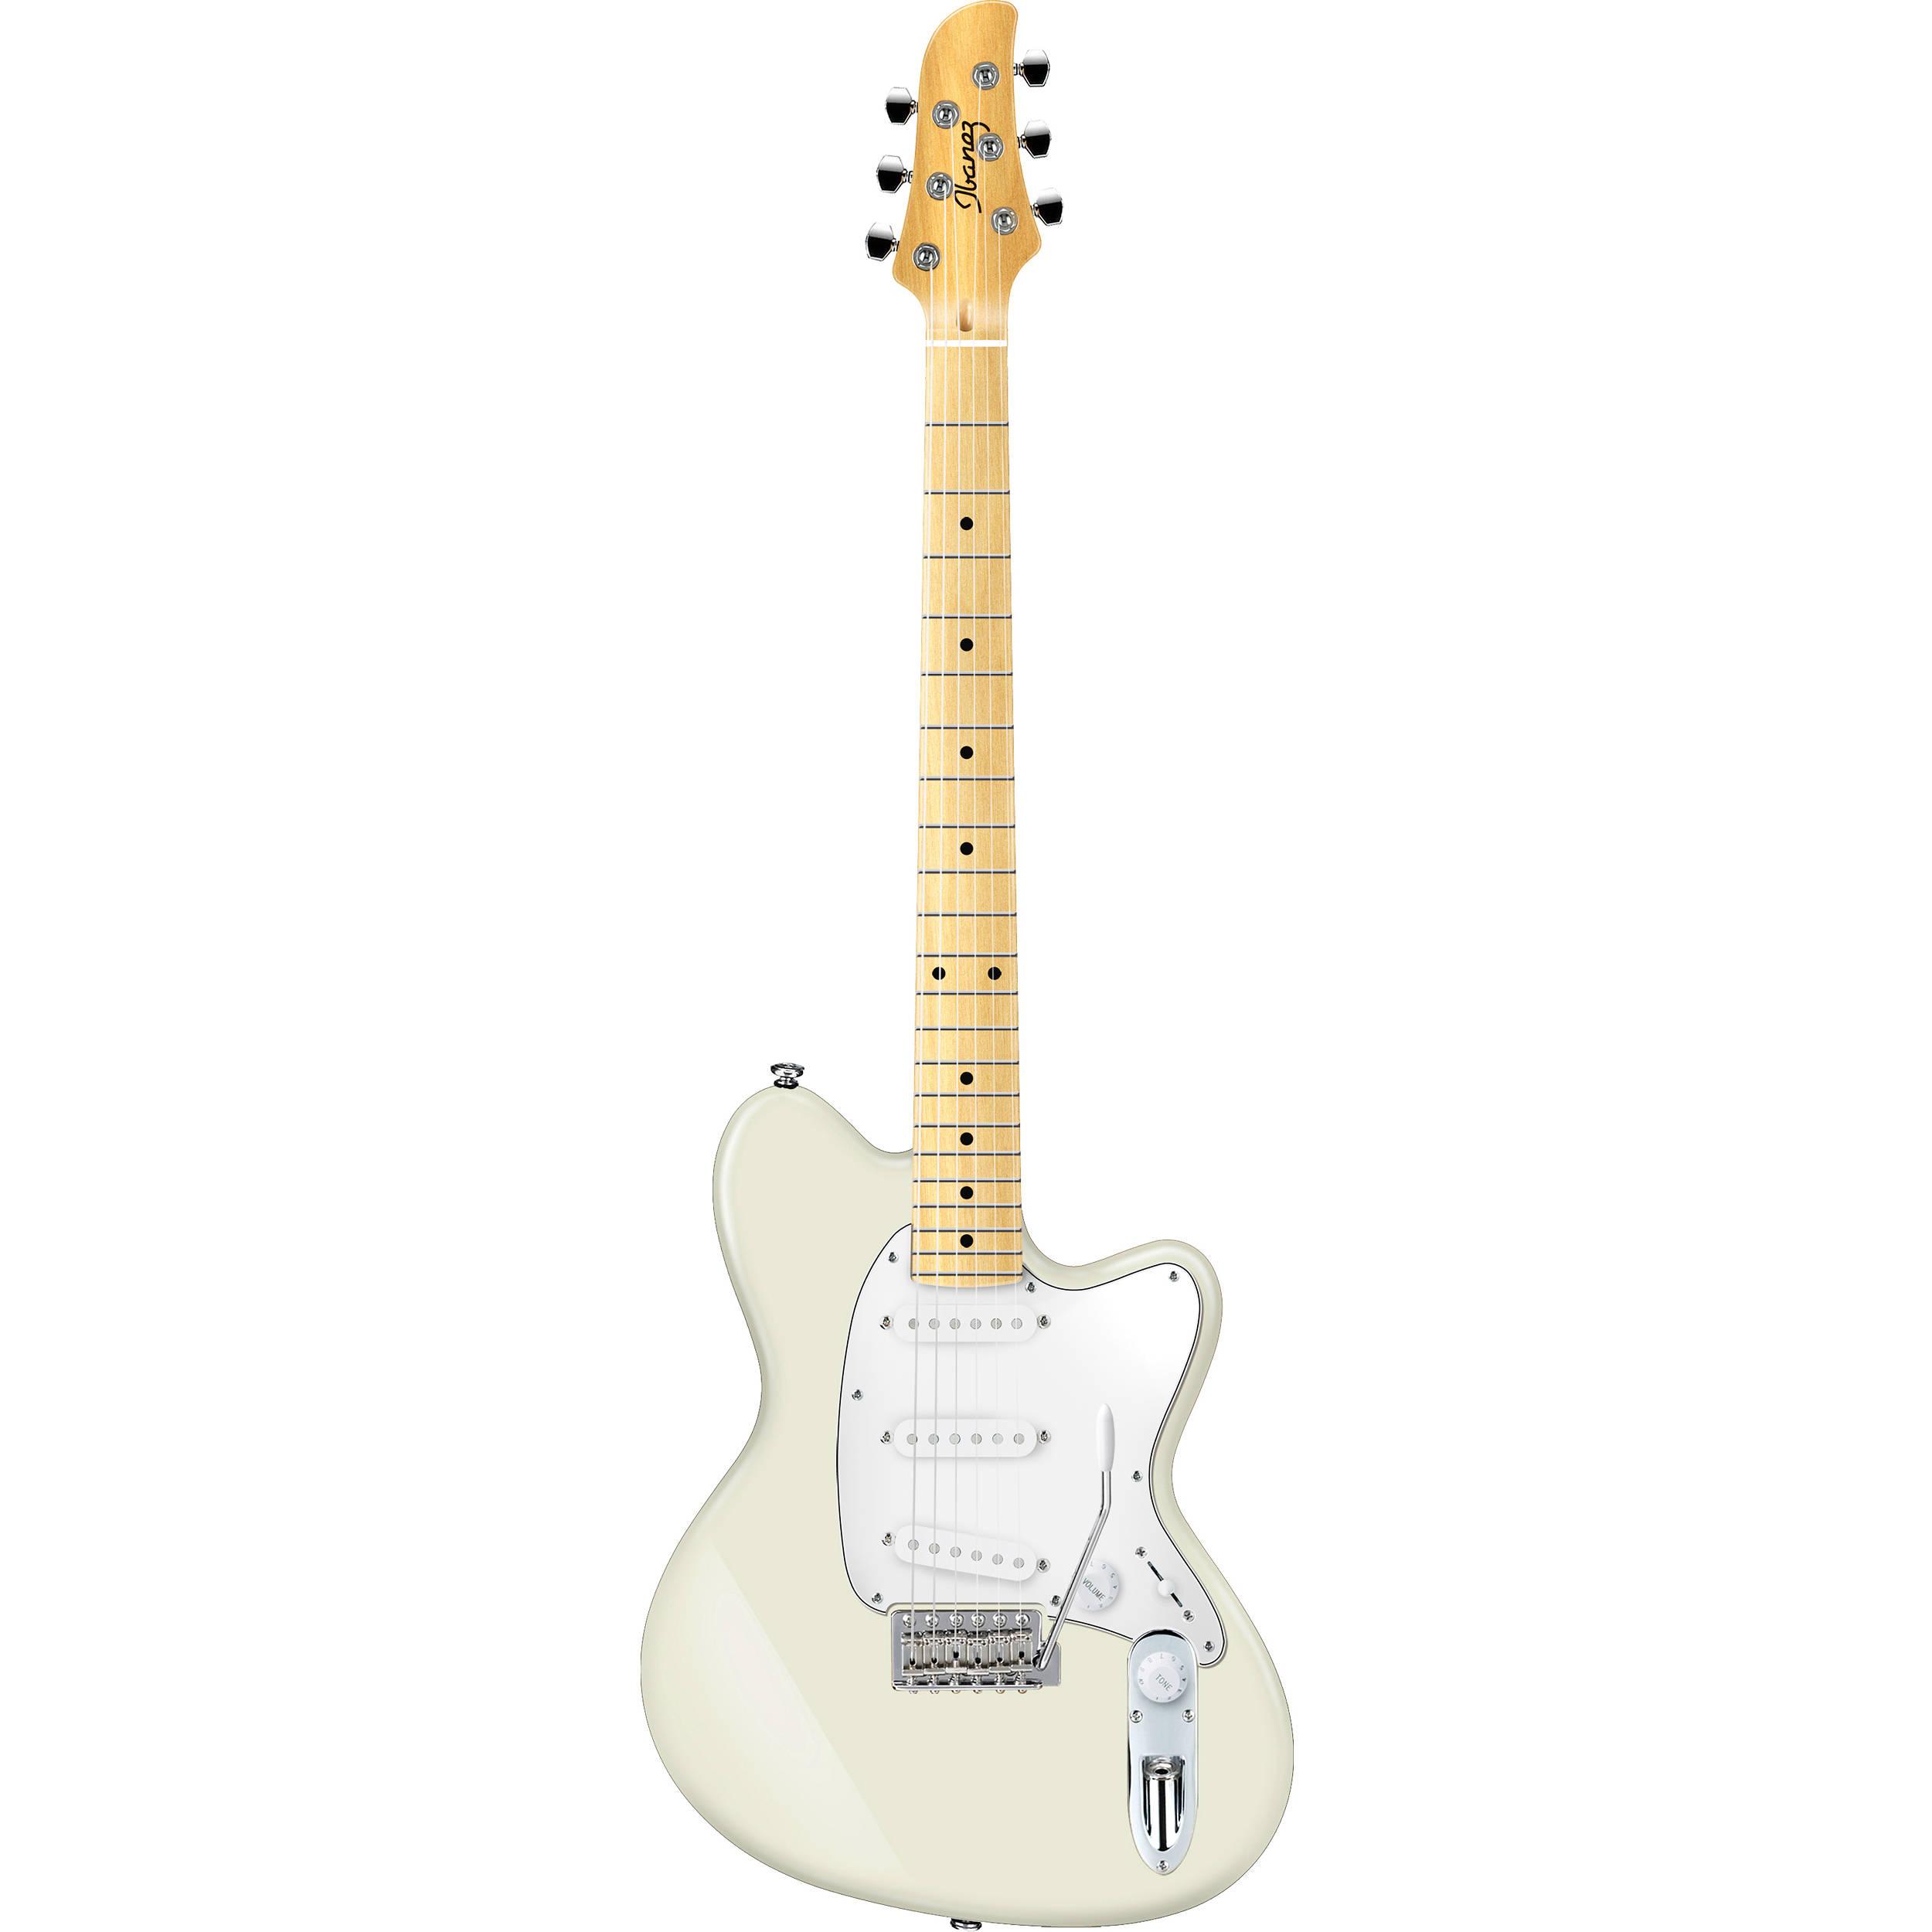 ibanez tm330m talman standard series electric guitar tm330miv. Black Bedroom Furniture Sets. Home Design Ideas